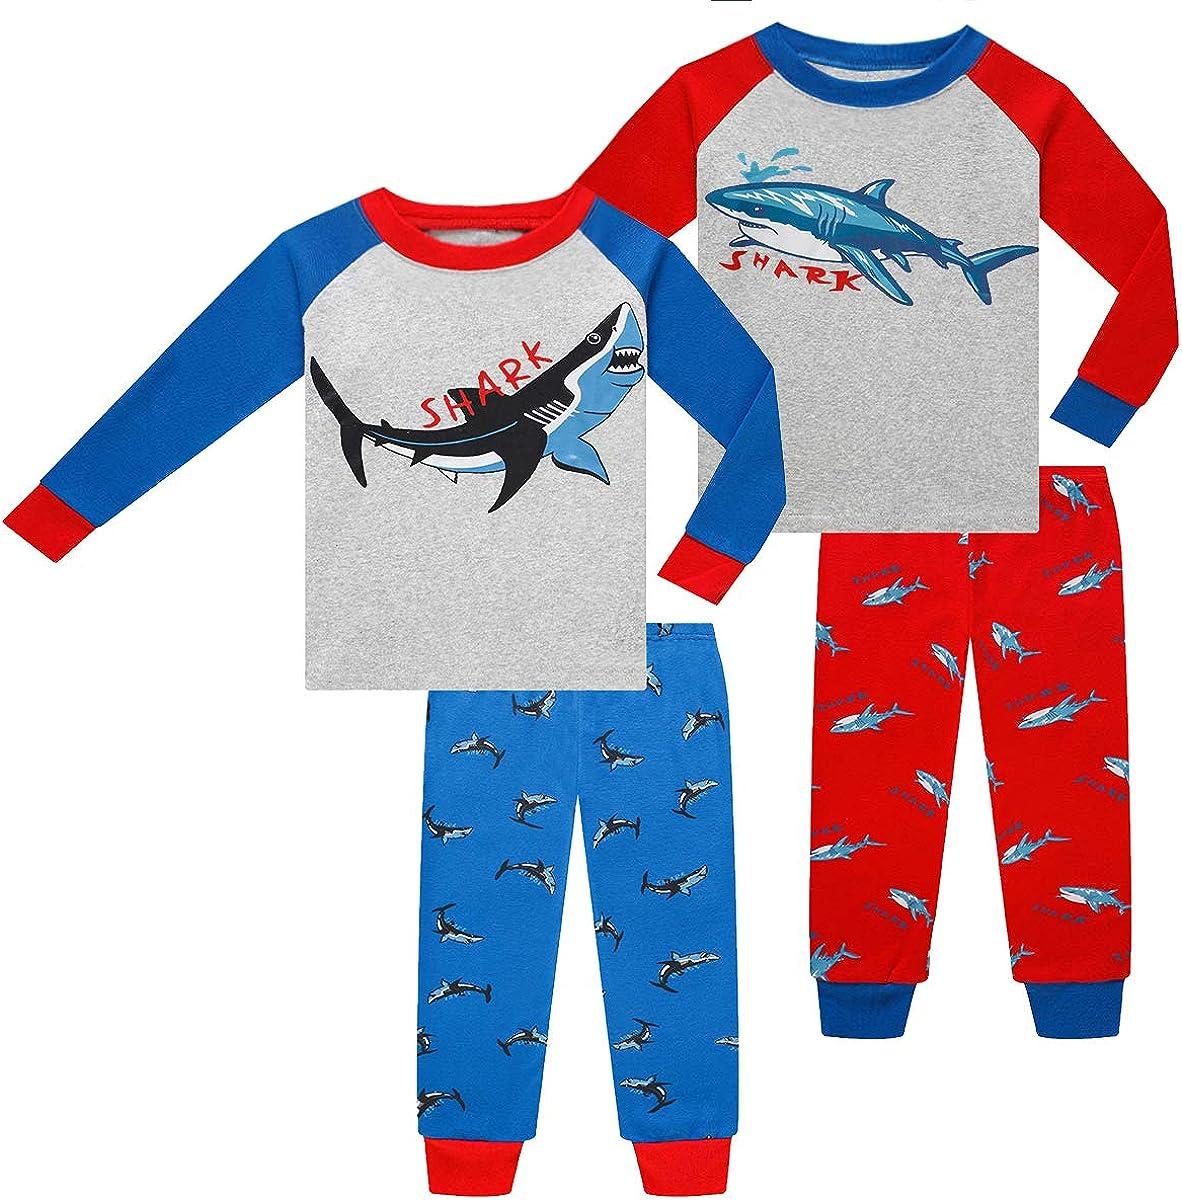 Joyond Cotton Pajamas for Boys Toddler Clothes Kids Snug-Fit Long Sleeve Pjs Pants Set(blue&red shark, 12)